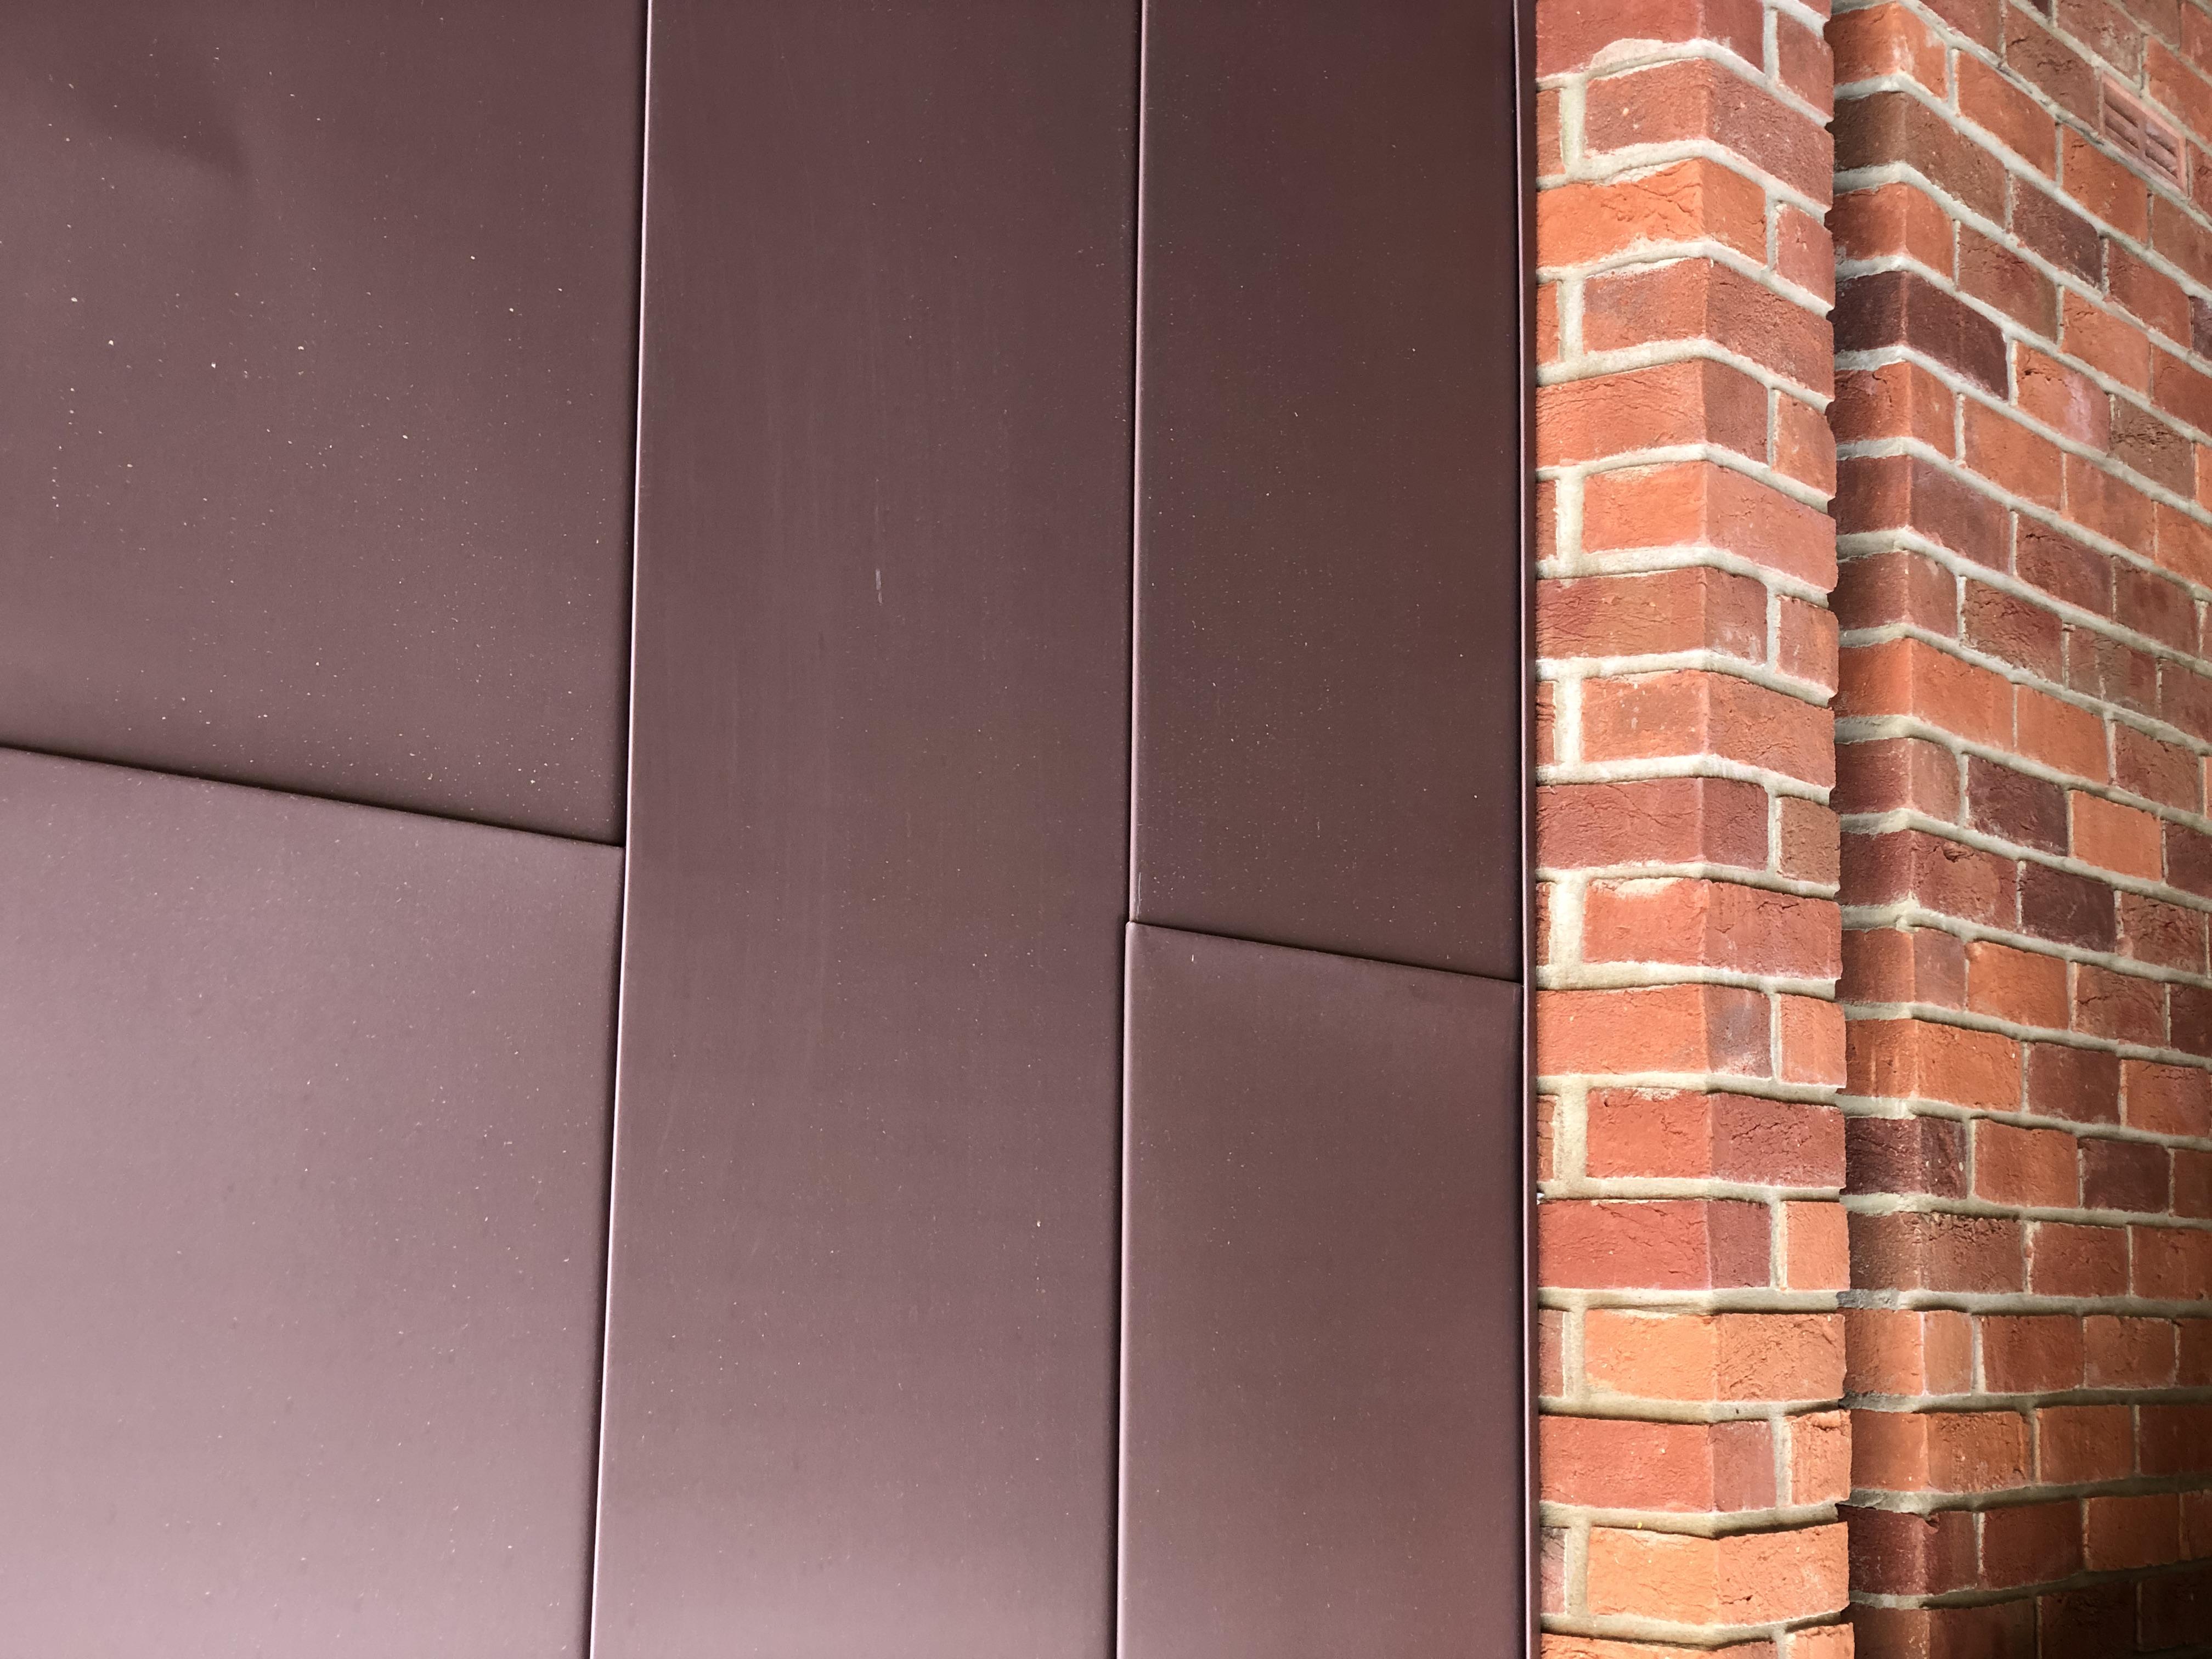 WWA Studios, WWA, West Waddy Archadia, Archadia, West Waddy, Architects, Town Planners, Urban Designers, Zinc, VM Zinc, VM, colourful zinc, zinc detail, zinc cladding, zinc building, zinc facade